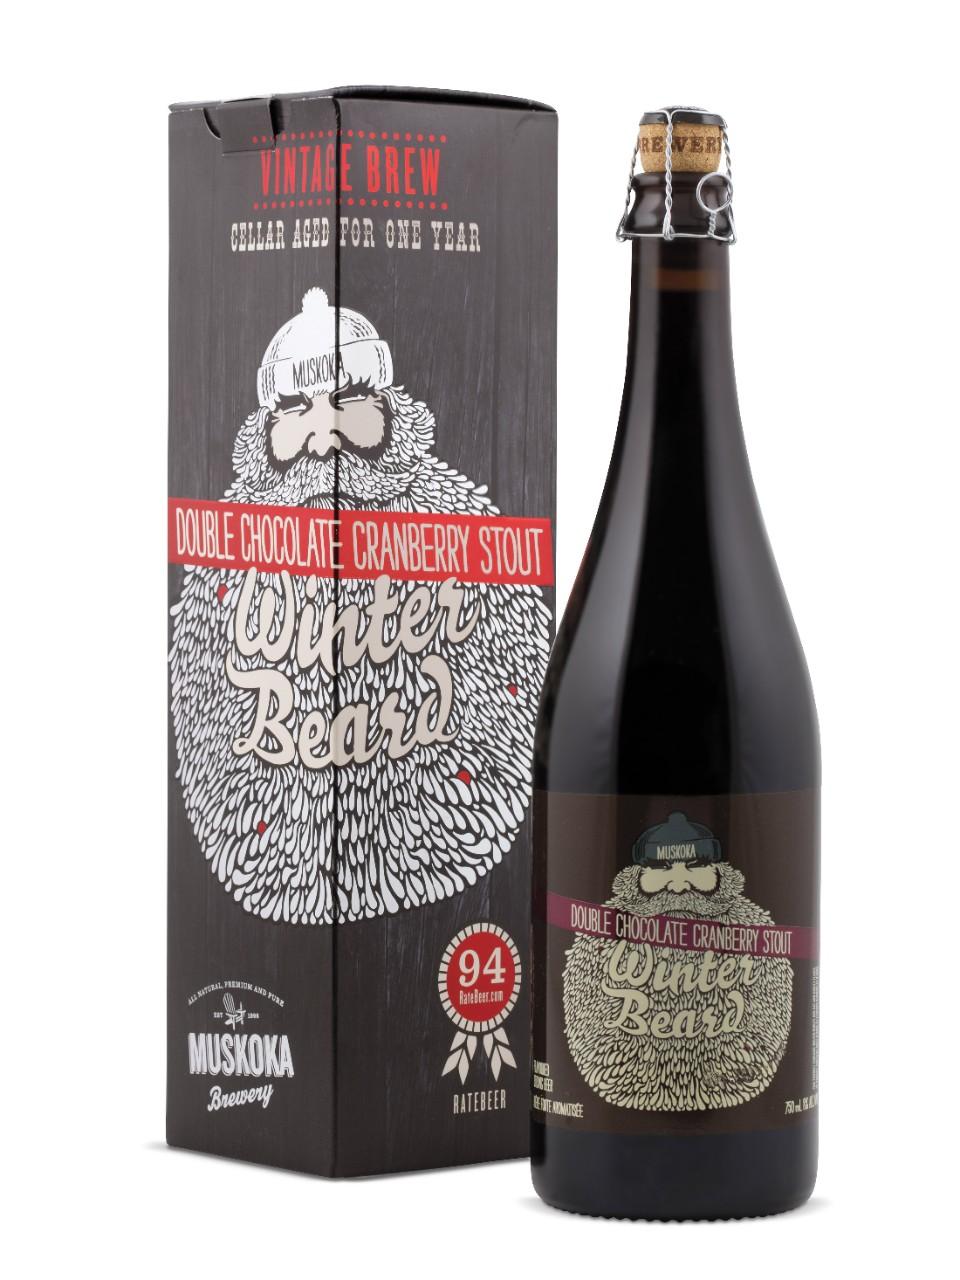 The Best Holiday Gifts for Men - winter beard muskoka brewery